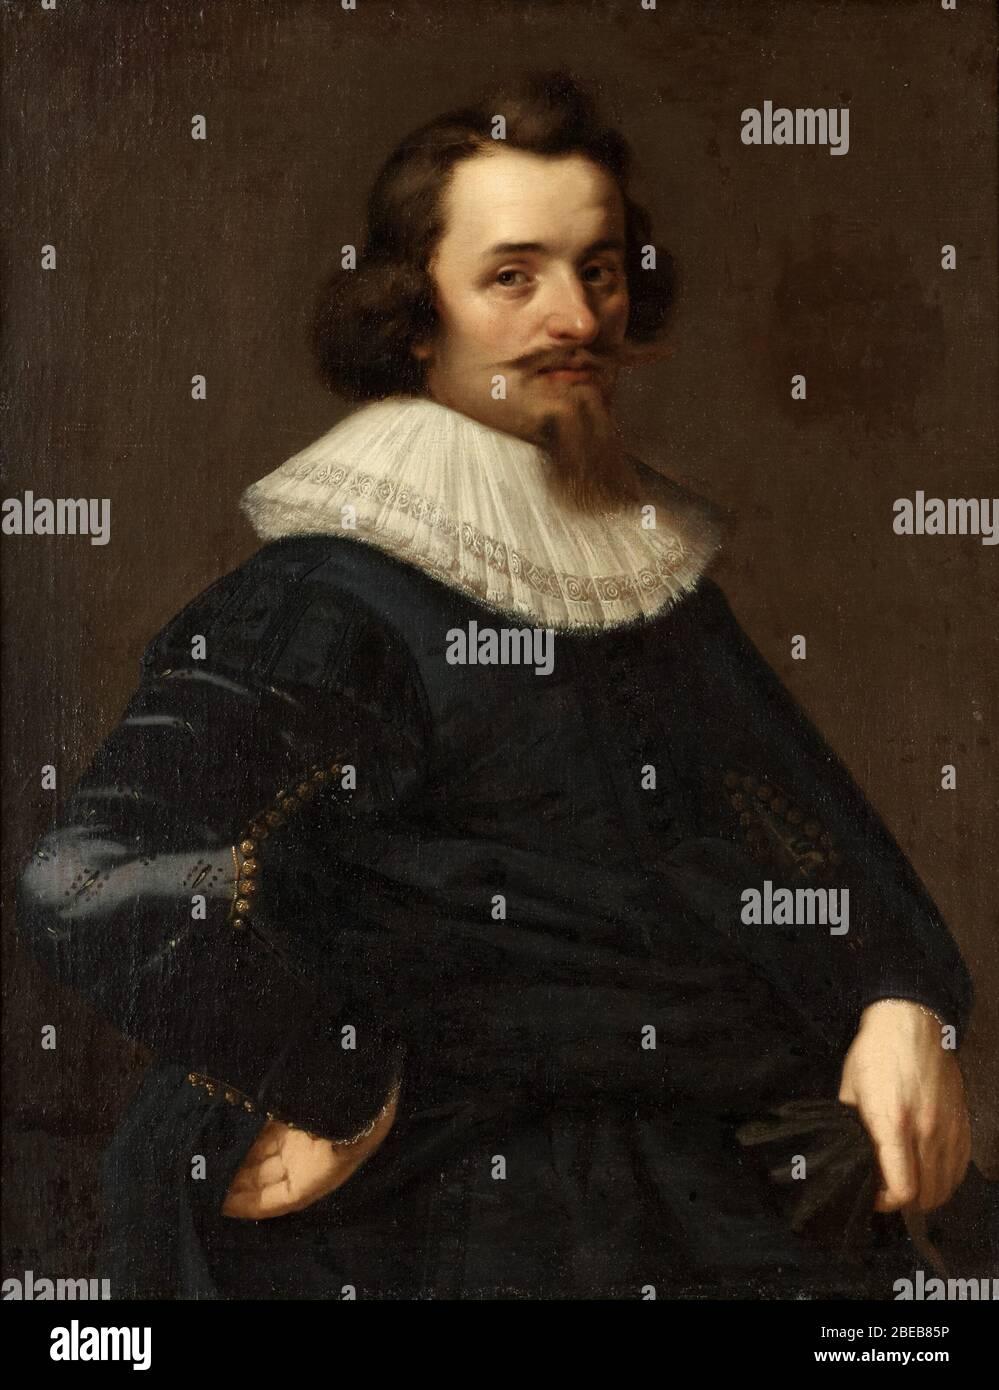 'Español: Barón Karl Gustafsson Banér (1598-1632)Svenska: Friherre Karl Gustafsson Banér (1598-1632); fecha del siglo XVII QS:P571,+1650-00-00T00:00:00Z/7; ' Foto de stock